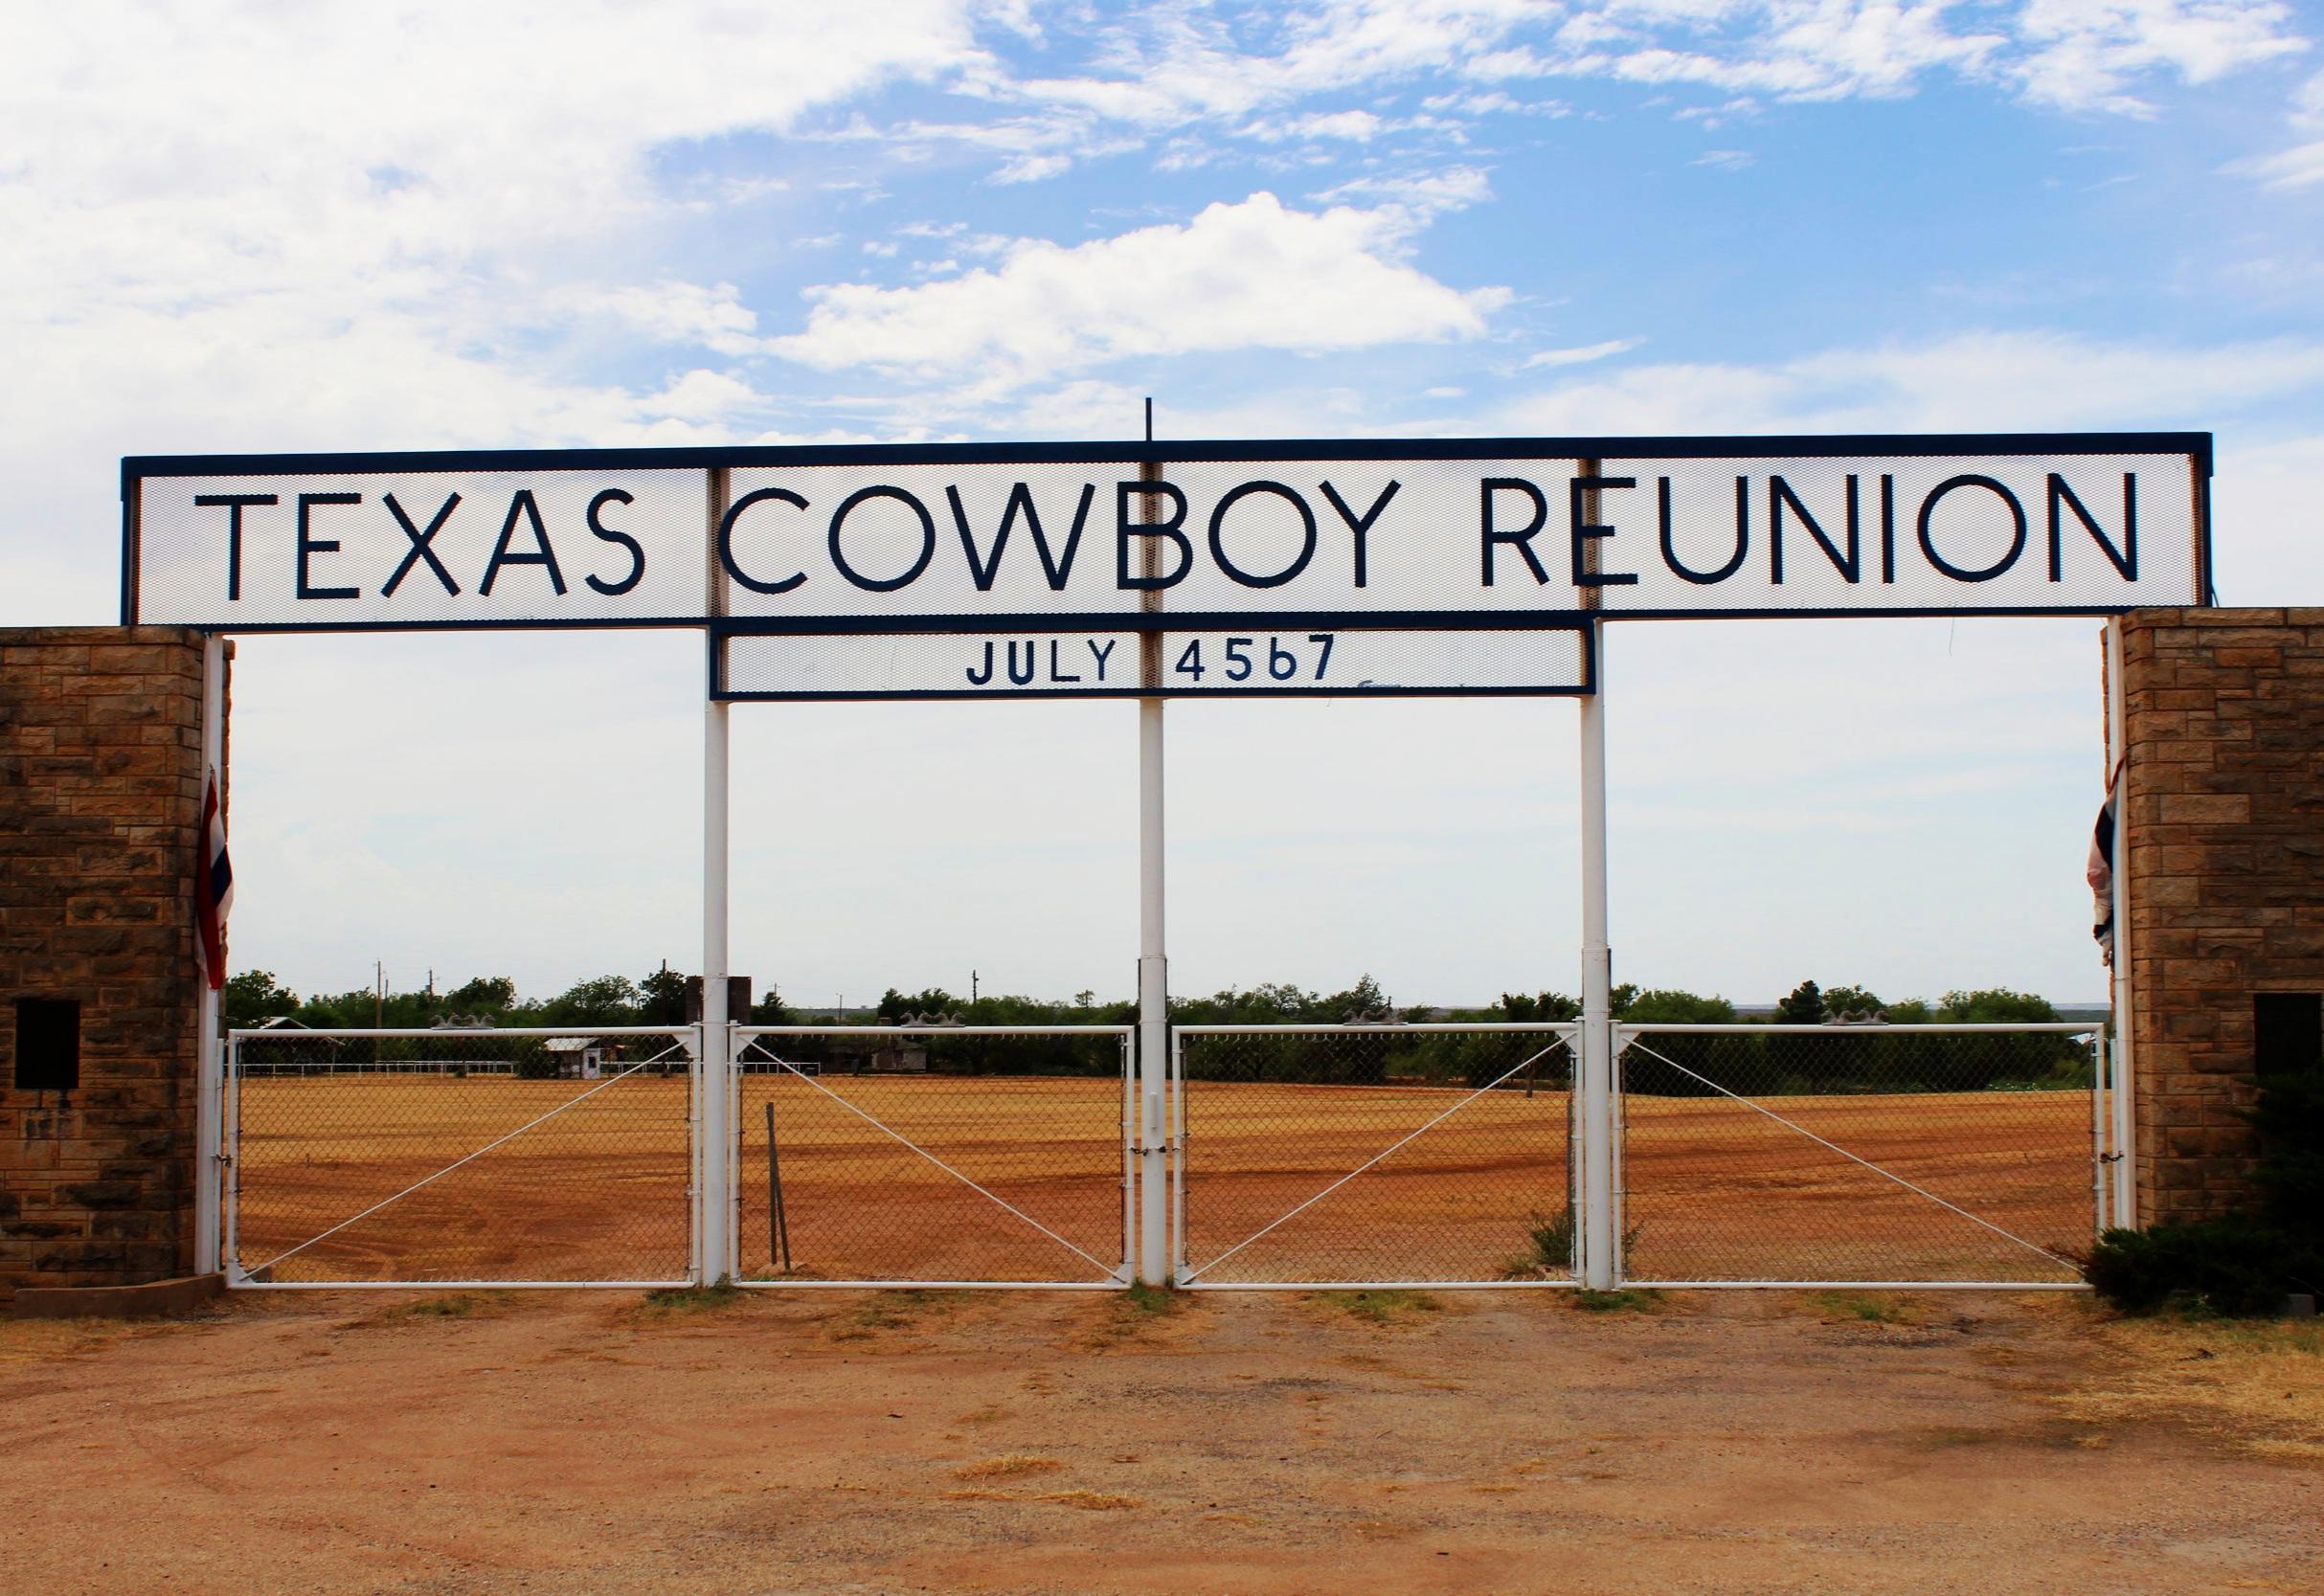 Texas Cowboy Reunion.JPG